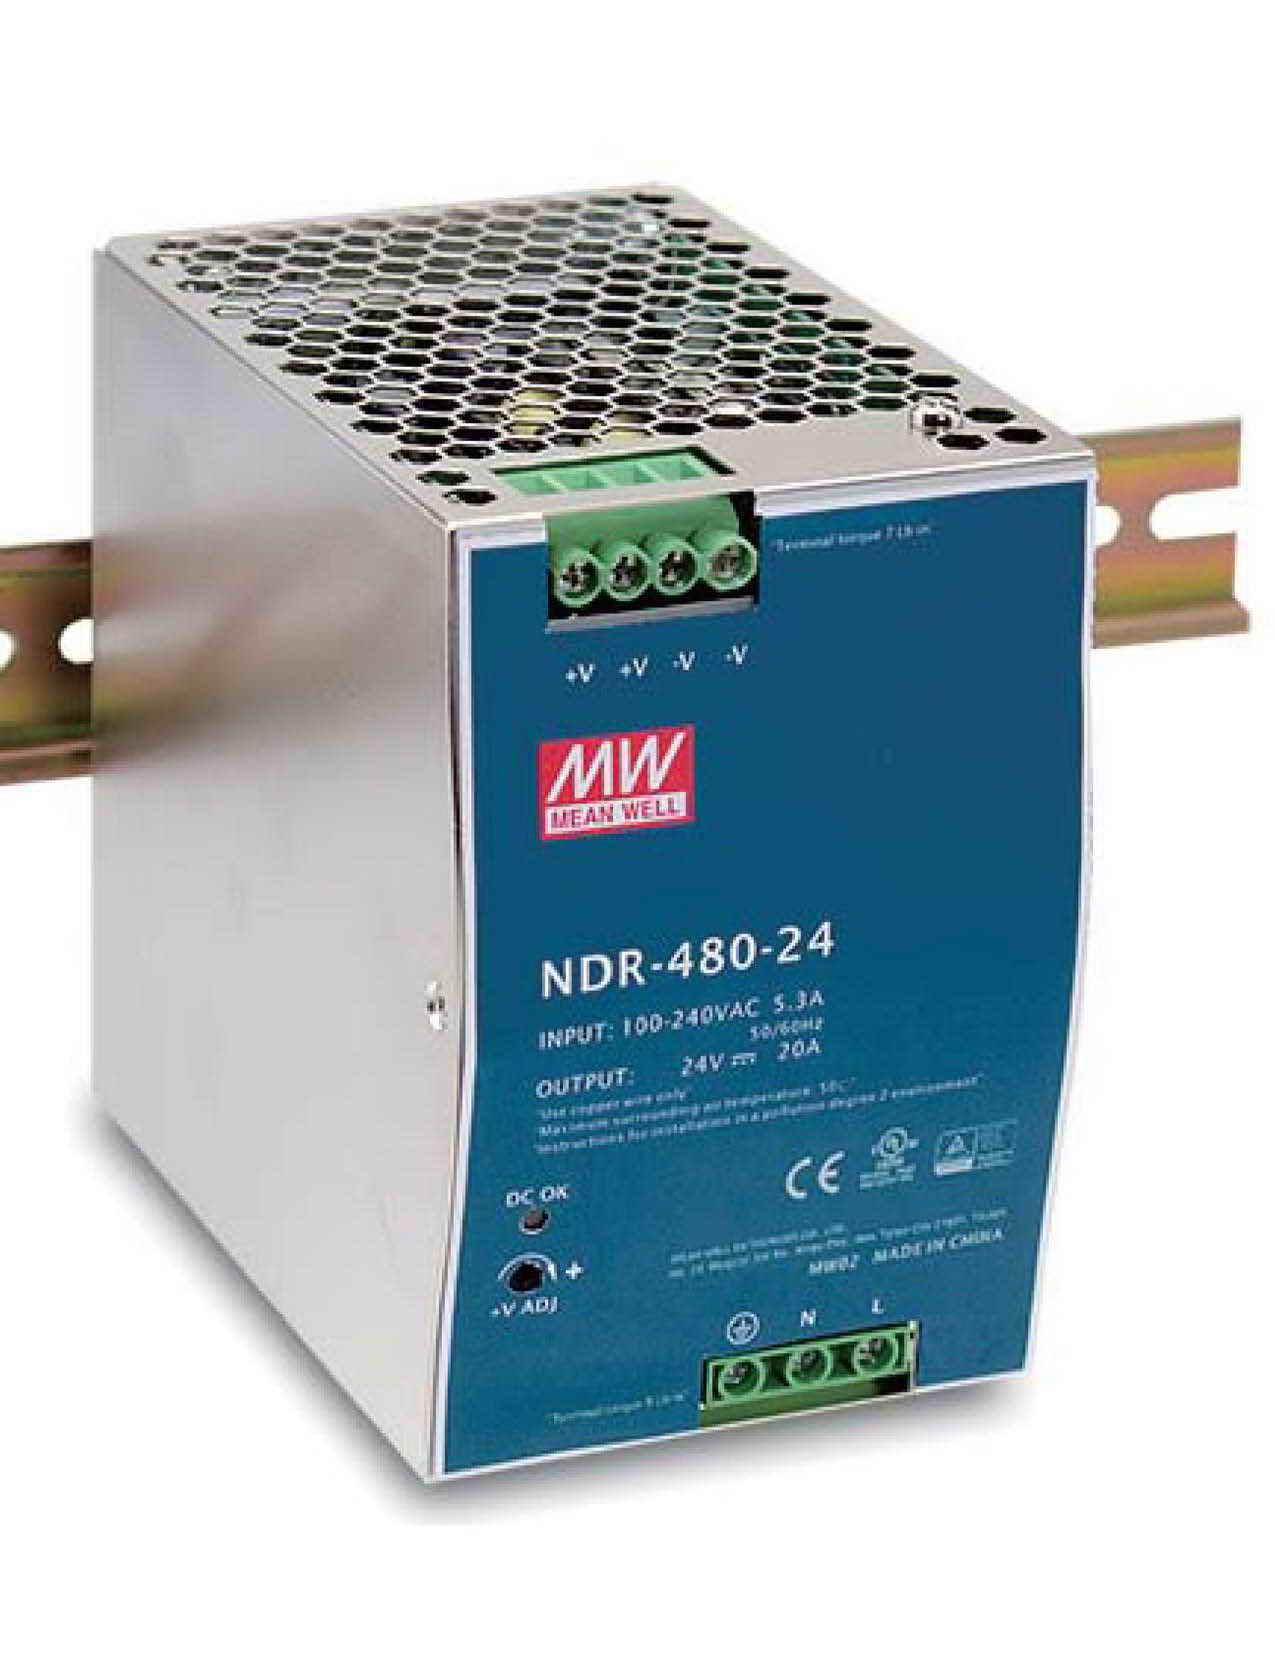 NDR-480, منبع تغذیه ریلی مینول 480 وات, NDR-480-24, منبع تغذیه ریلی مین ول 24 ولت 20 آمپر, Mean Well